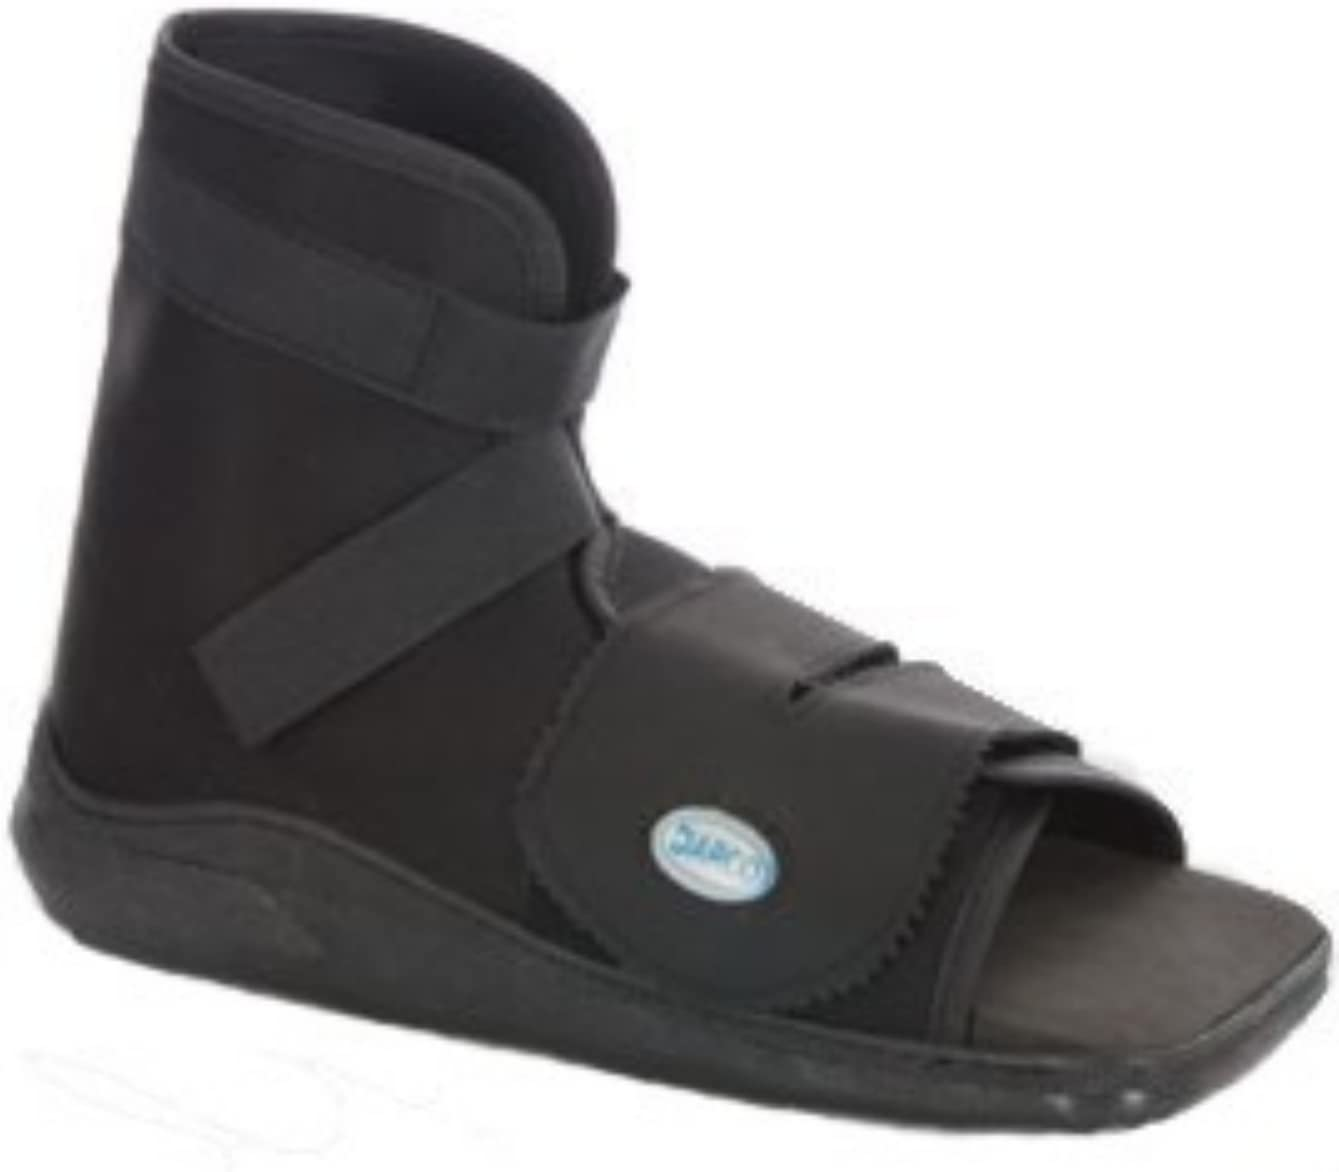 Darco Slimline Cast Boot, Large